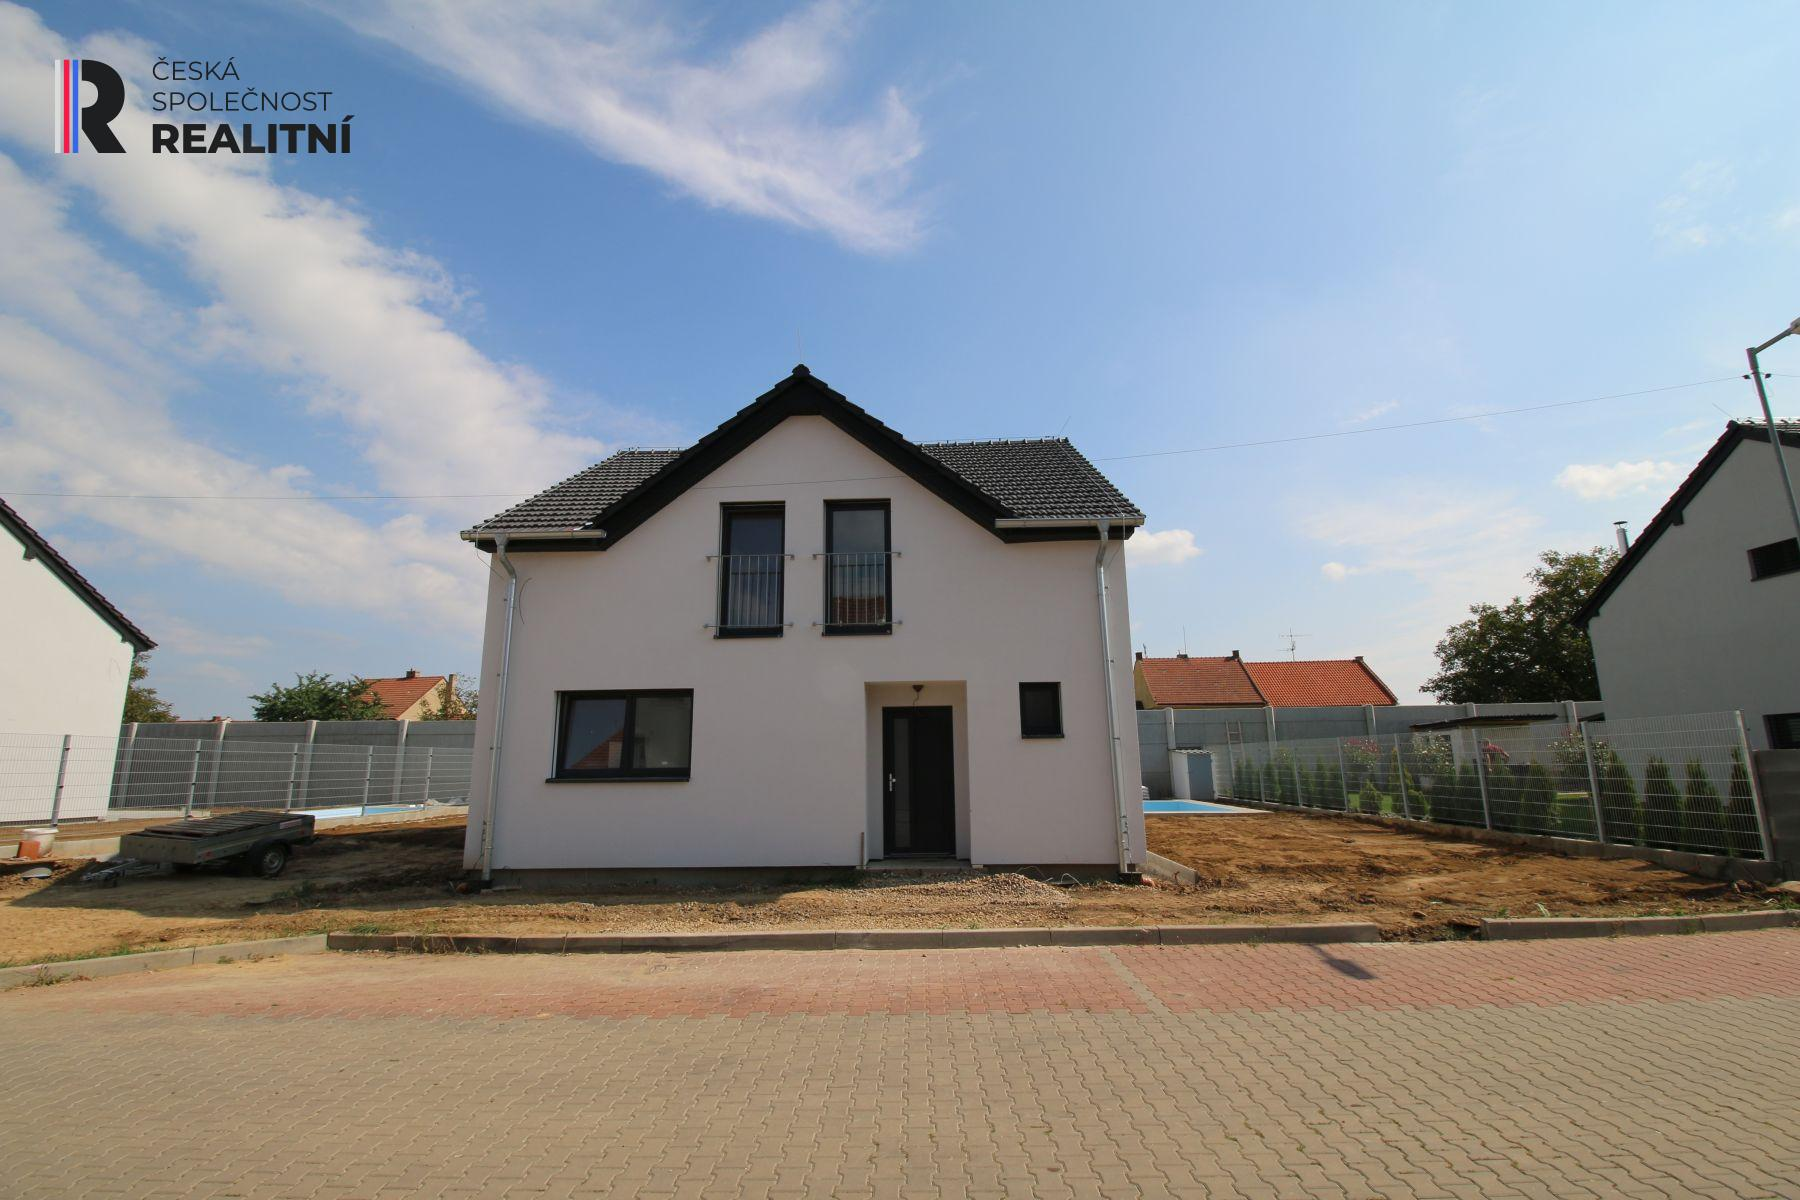 Rodinný dům 5+kk, 160m2, pozemek 436m2